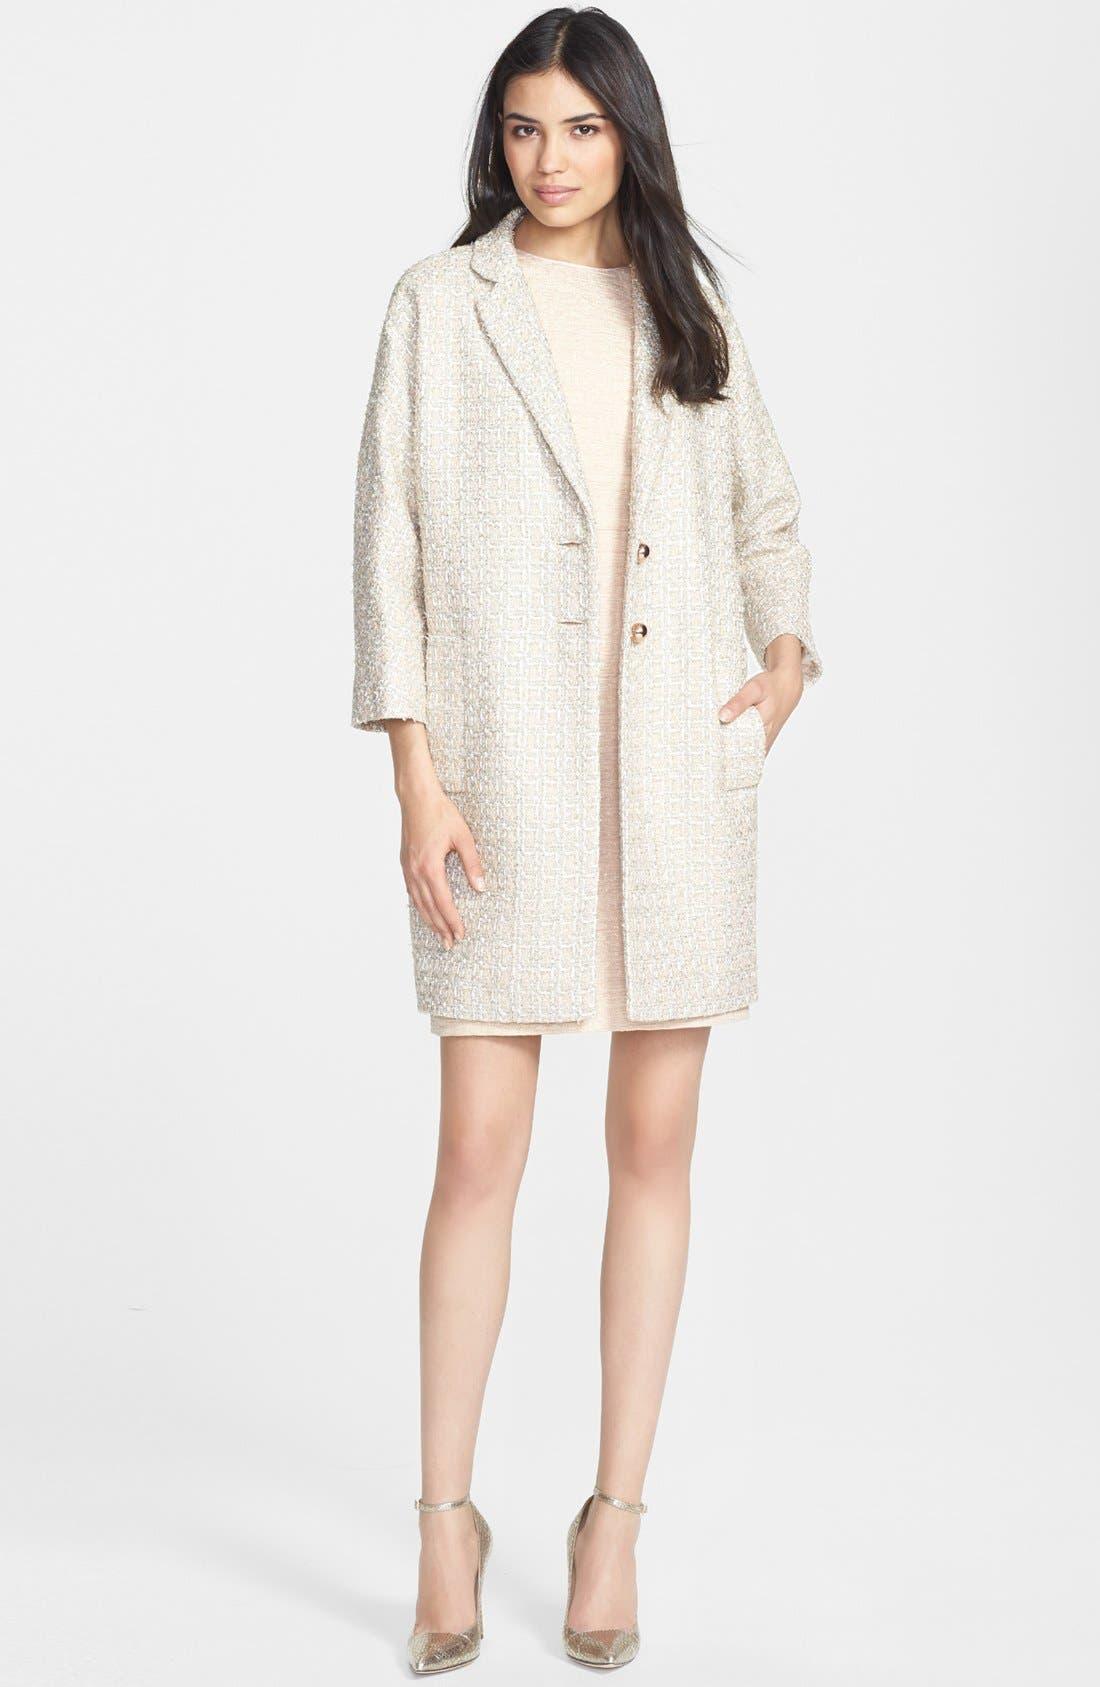 Alternate Image 1 Selected - kate spade new york coat & sheath dress